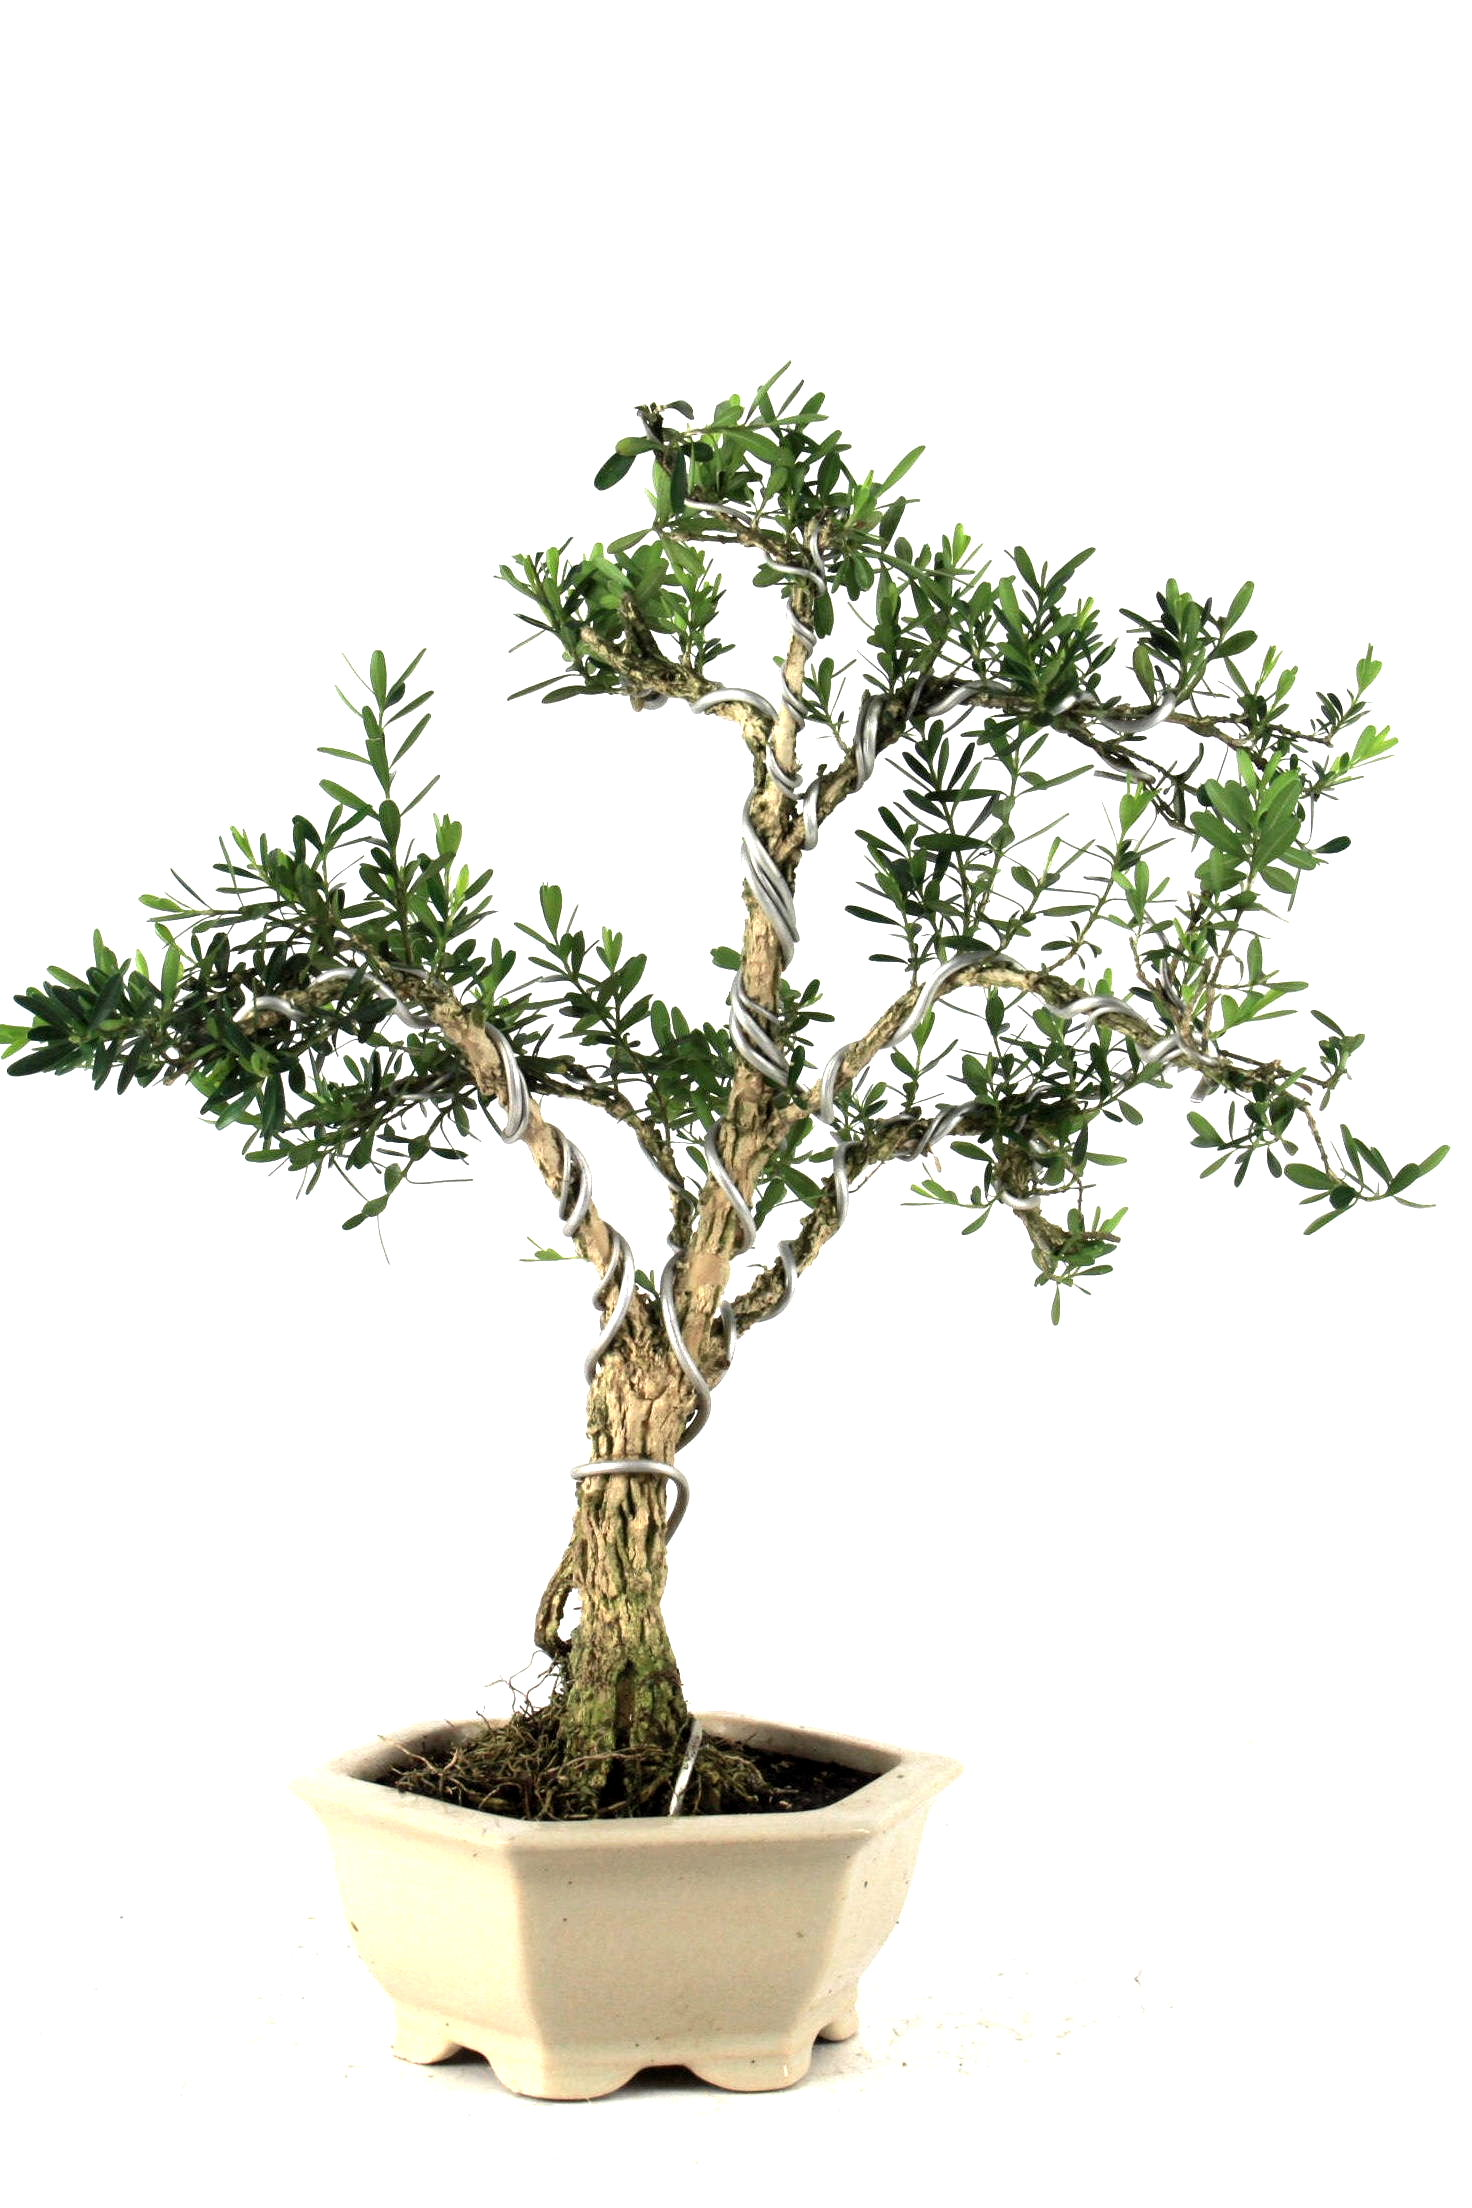 harland buxbaum 36 cm 12 bei oyaki bonsai kaufen. Black Bedroom Furniture Sets. Home Design Ideas